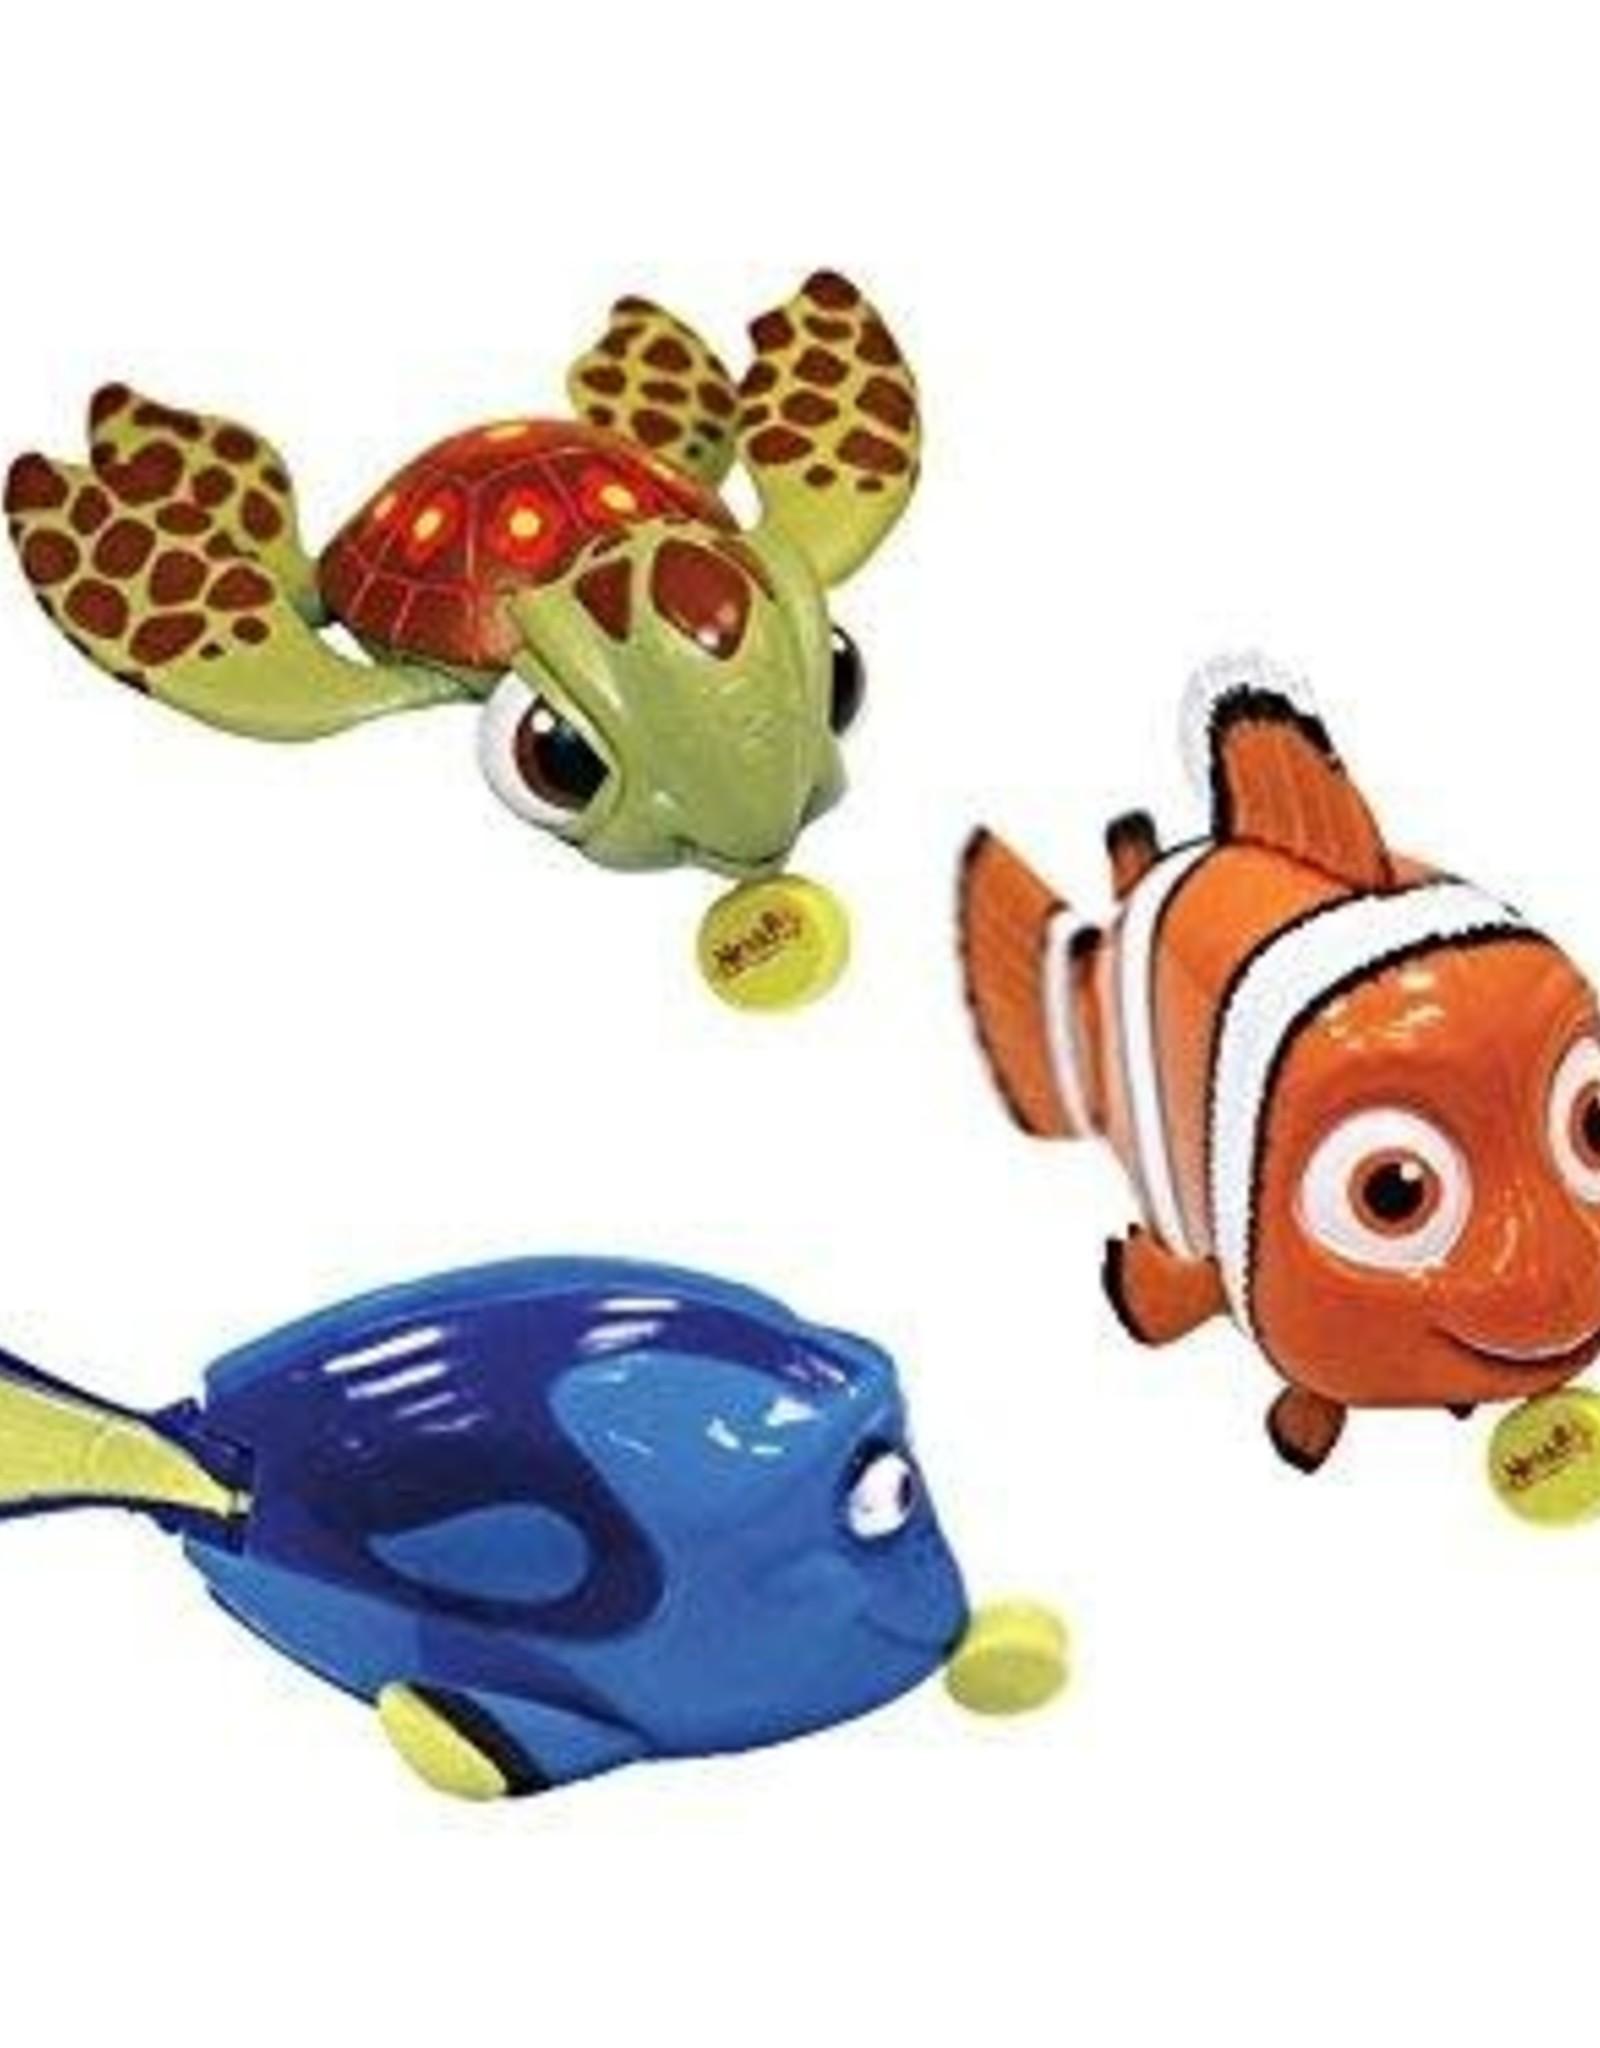 Swimways Dory Swimmers